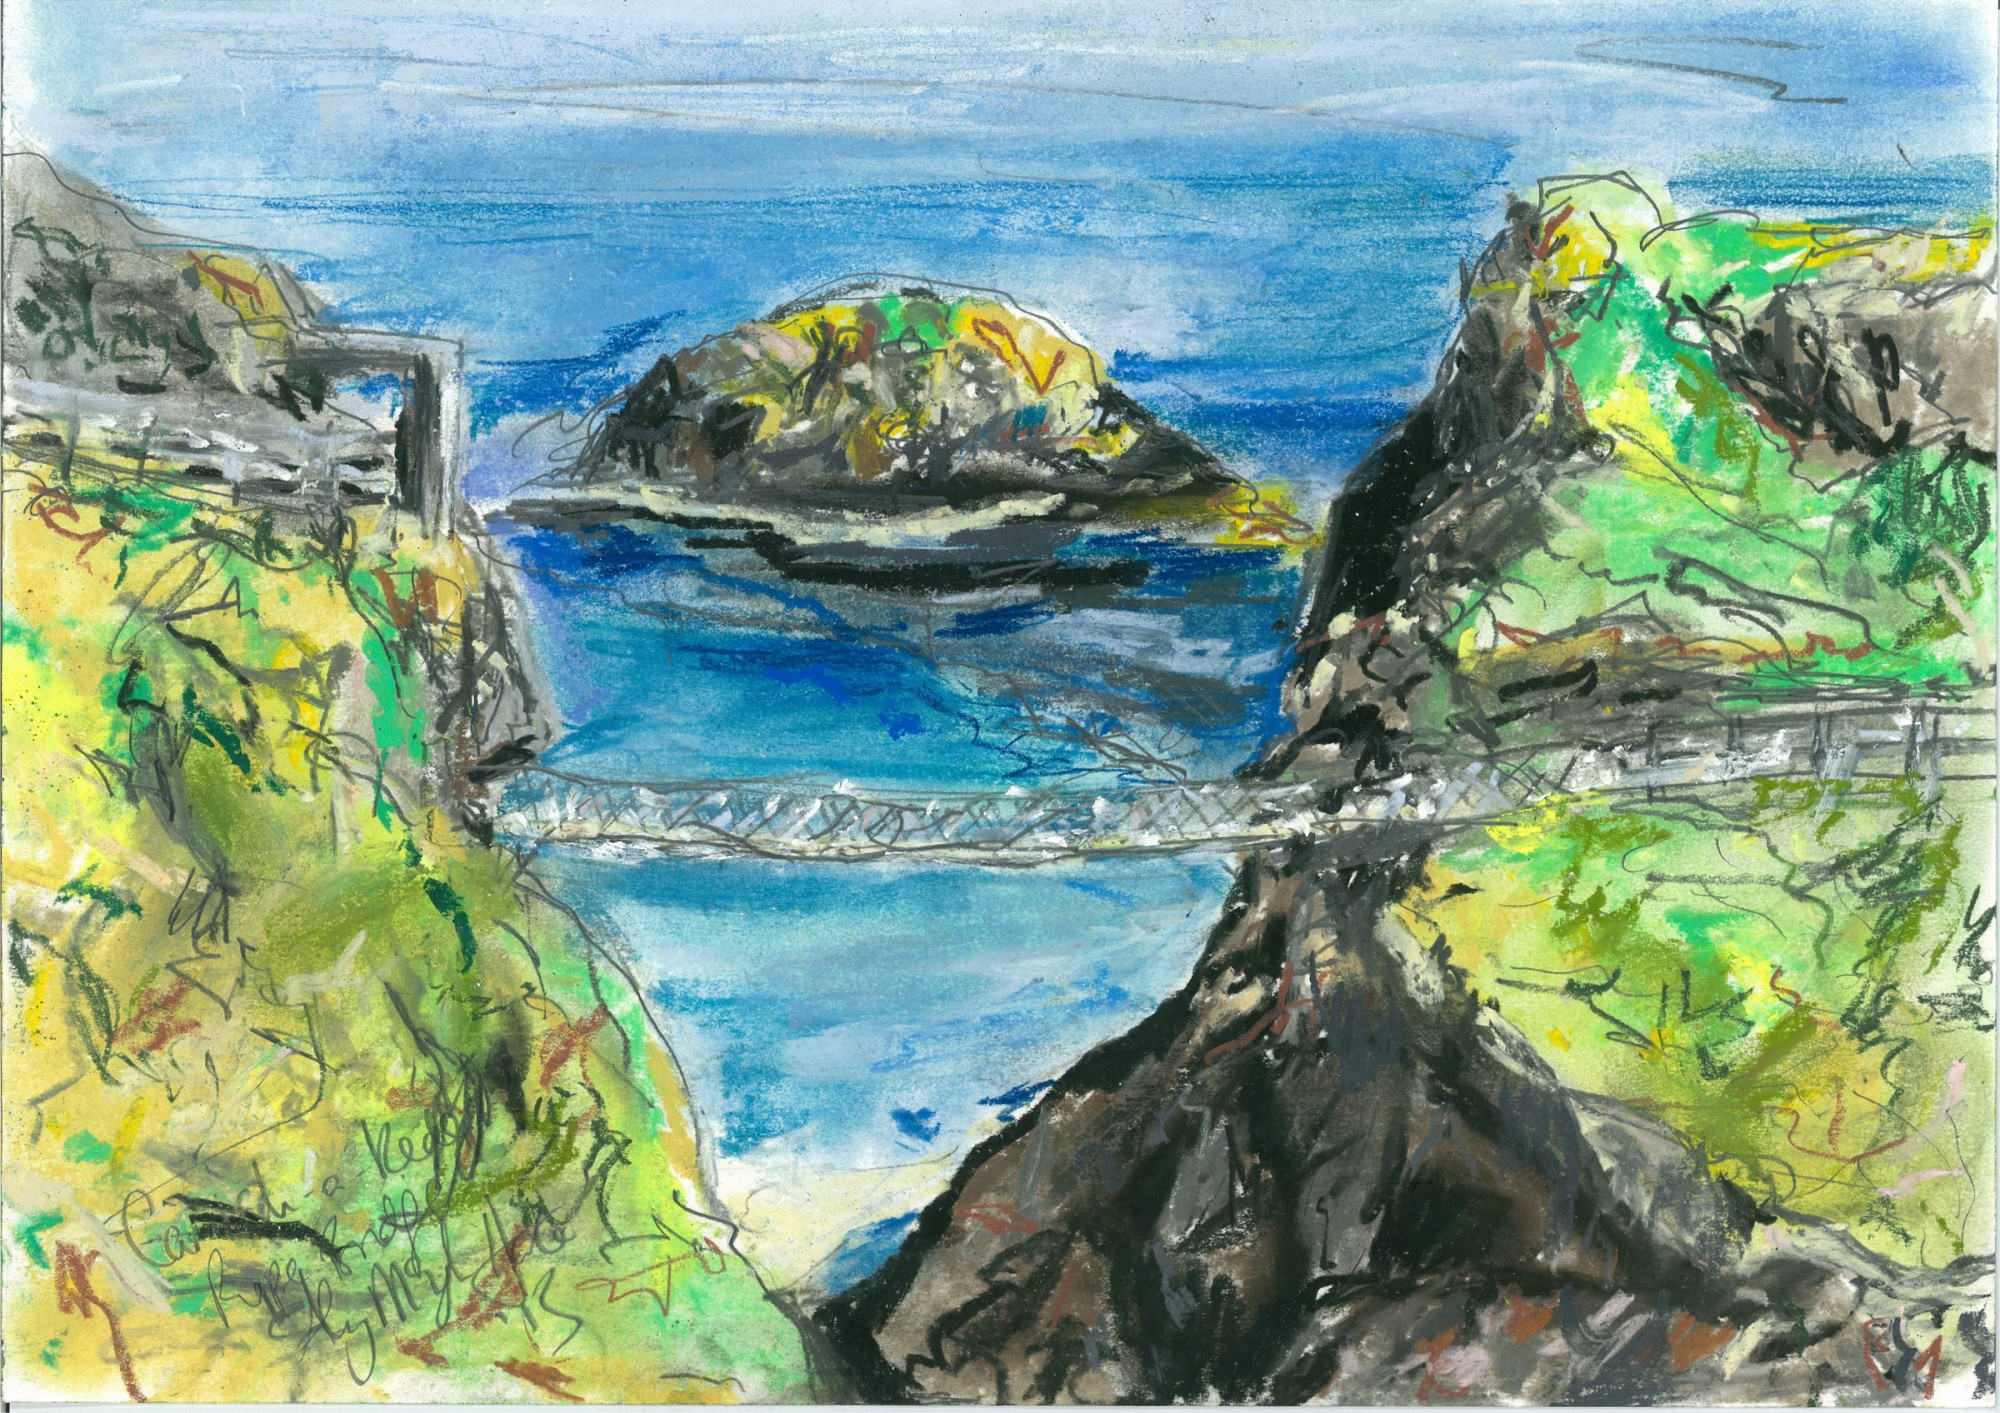 Carrick-A-Rede Rope Bridge/ Antrim Coast  Artist -  Aly Harte